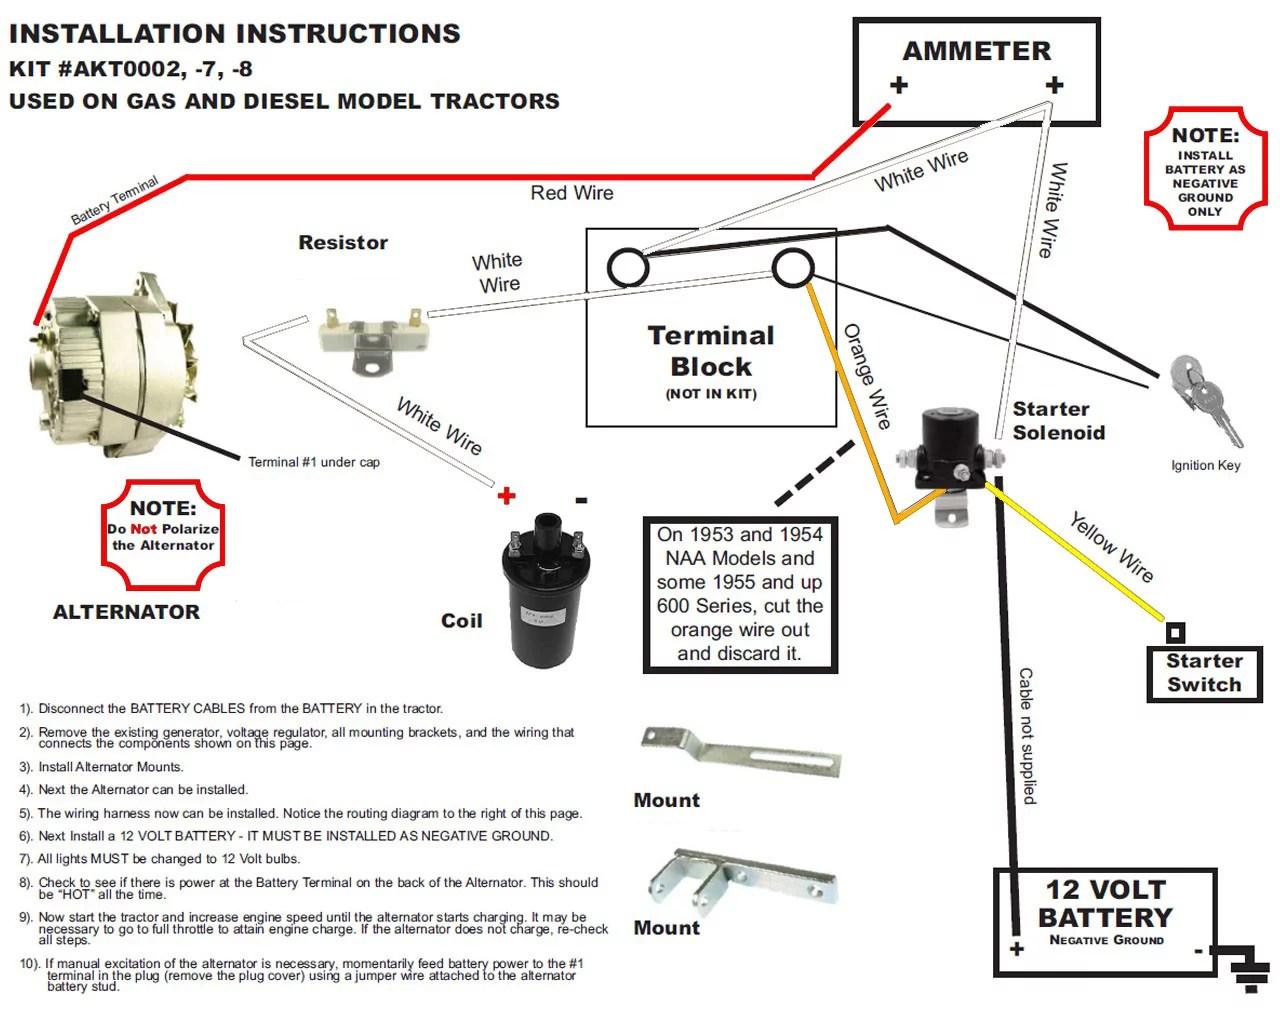 medium resolution of new alternator conversion kit fits ford naa tractor generator 851new alternator conversion kit fits ford naa